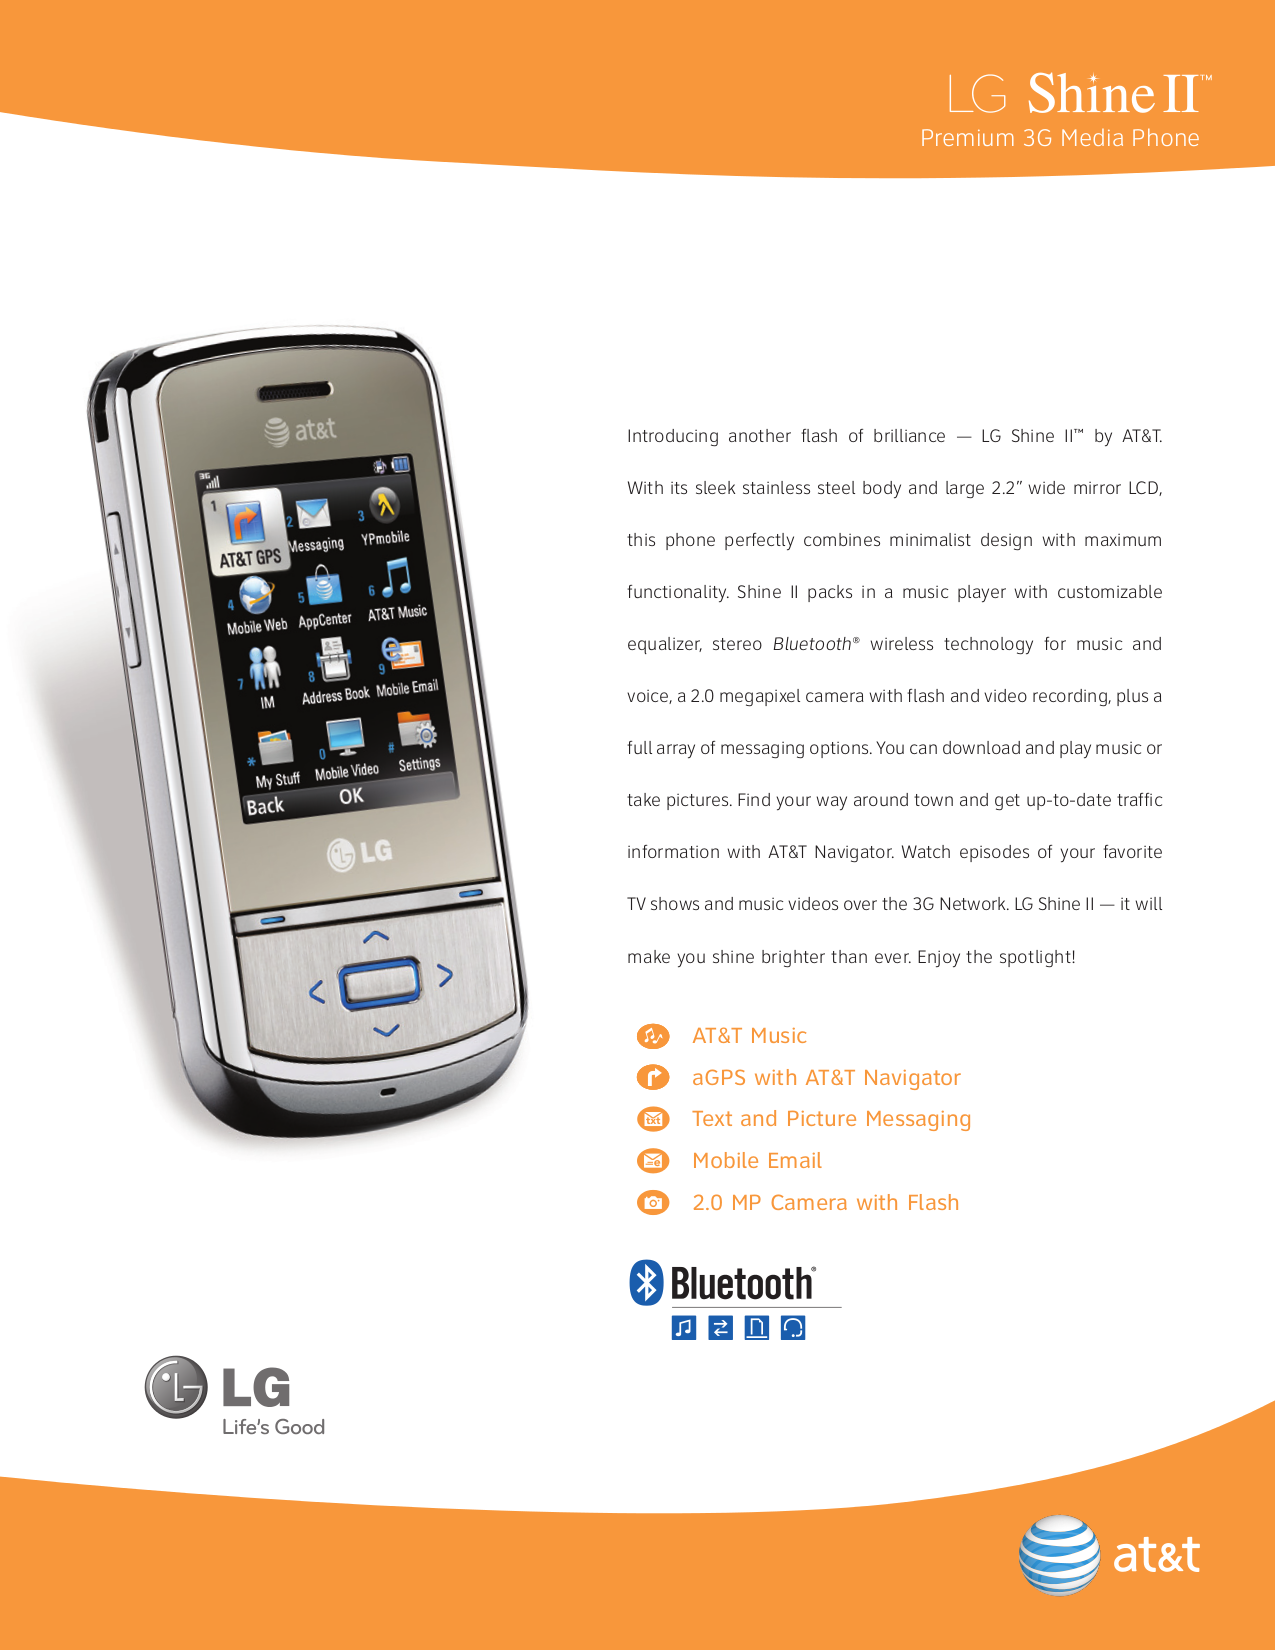 pdf for LG Cell Phone Shine II manual